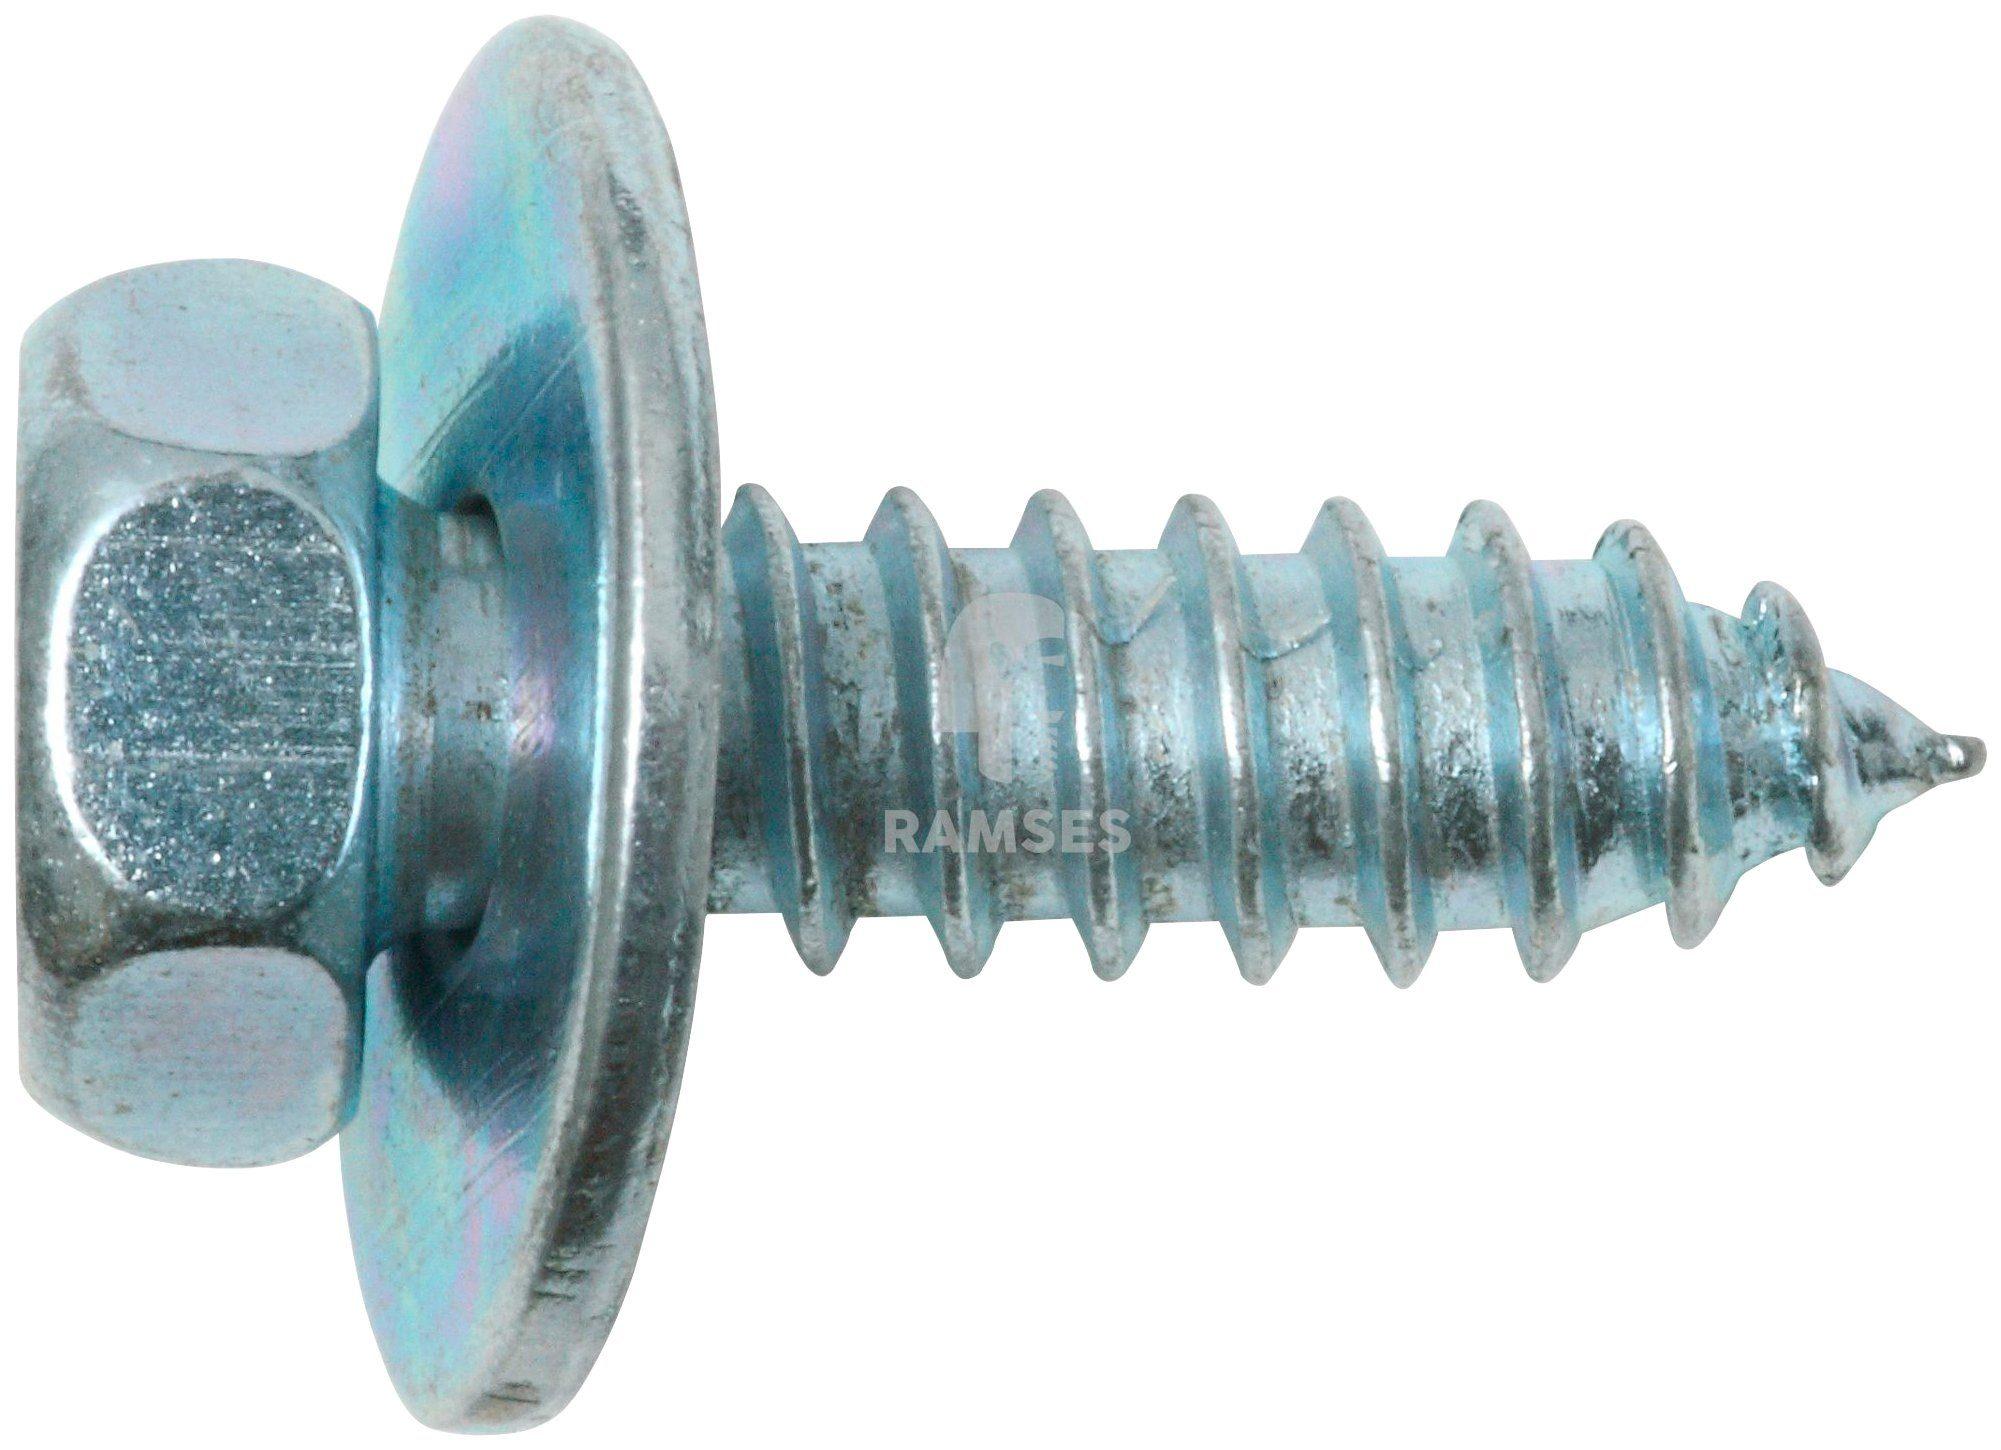 RAMSES Schrauben , Kombi Blechschraube 4,8 x 19 mm SW8 100 Stk.